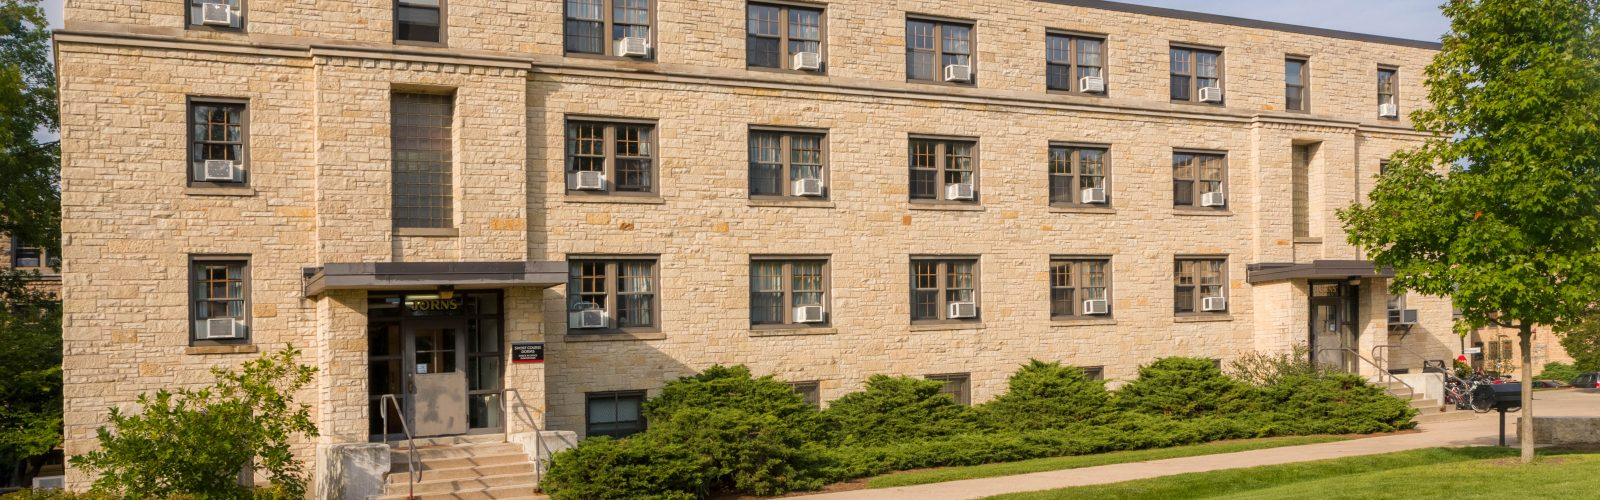 Exterior photo of Jorns Hall